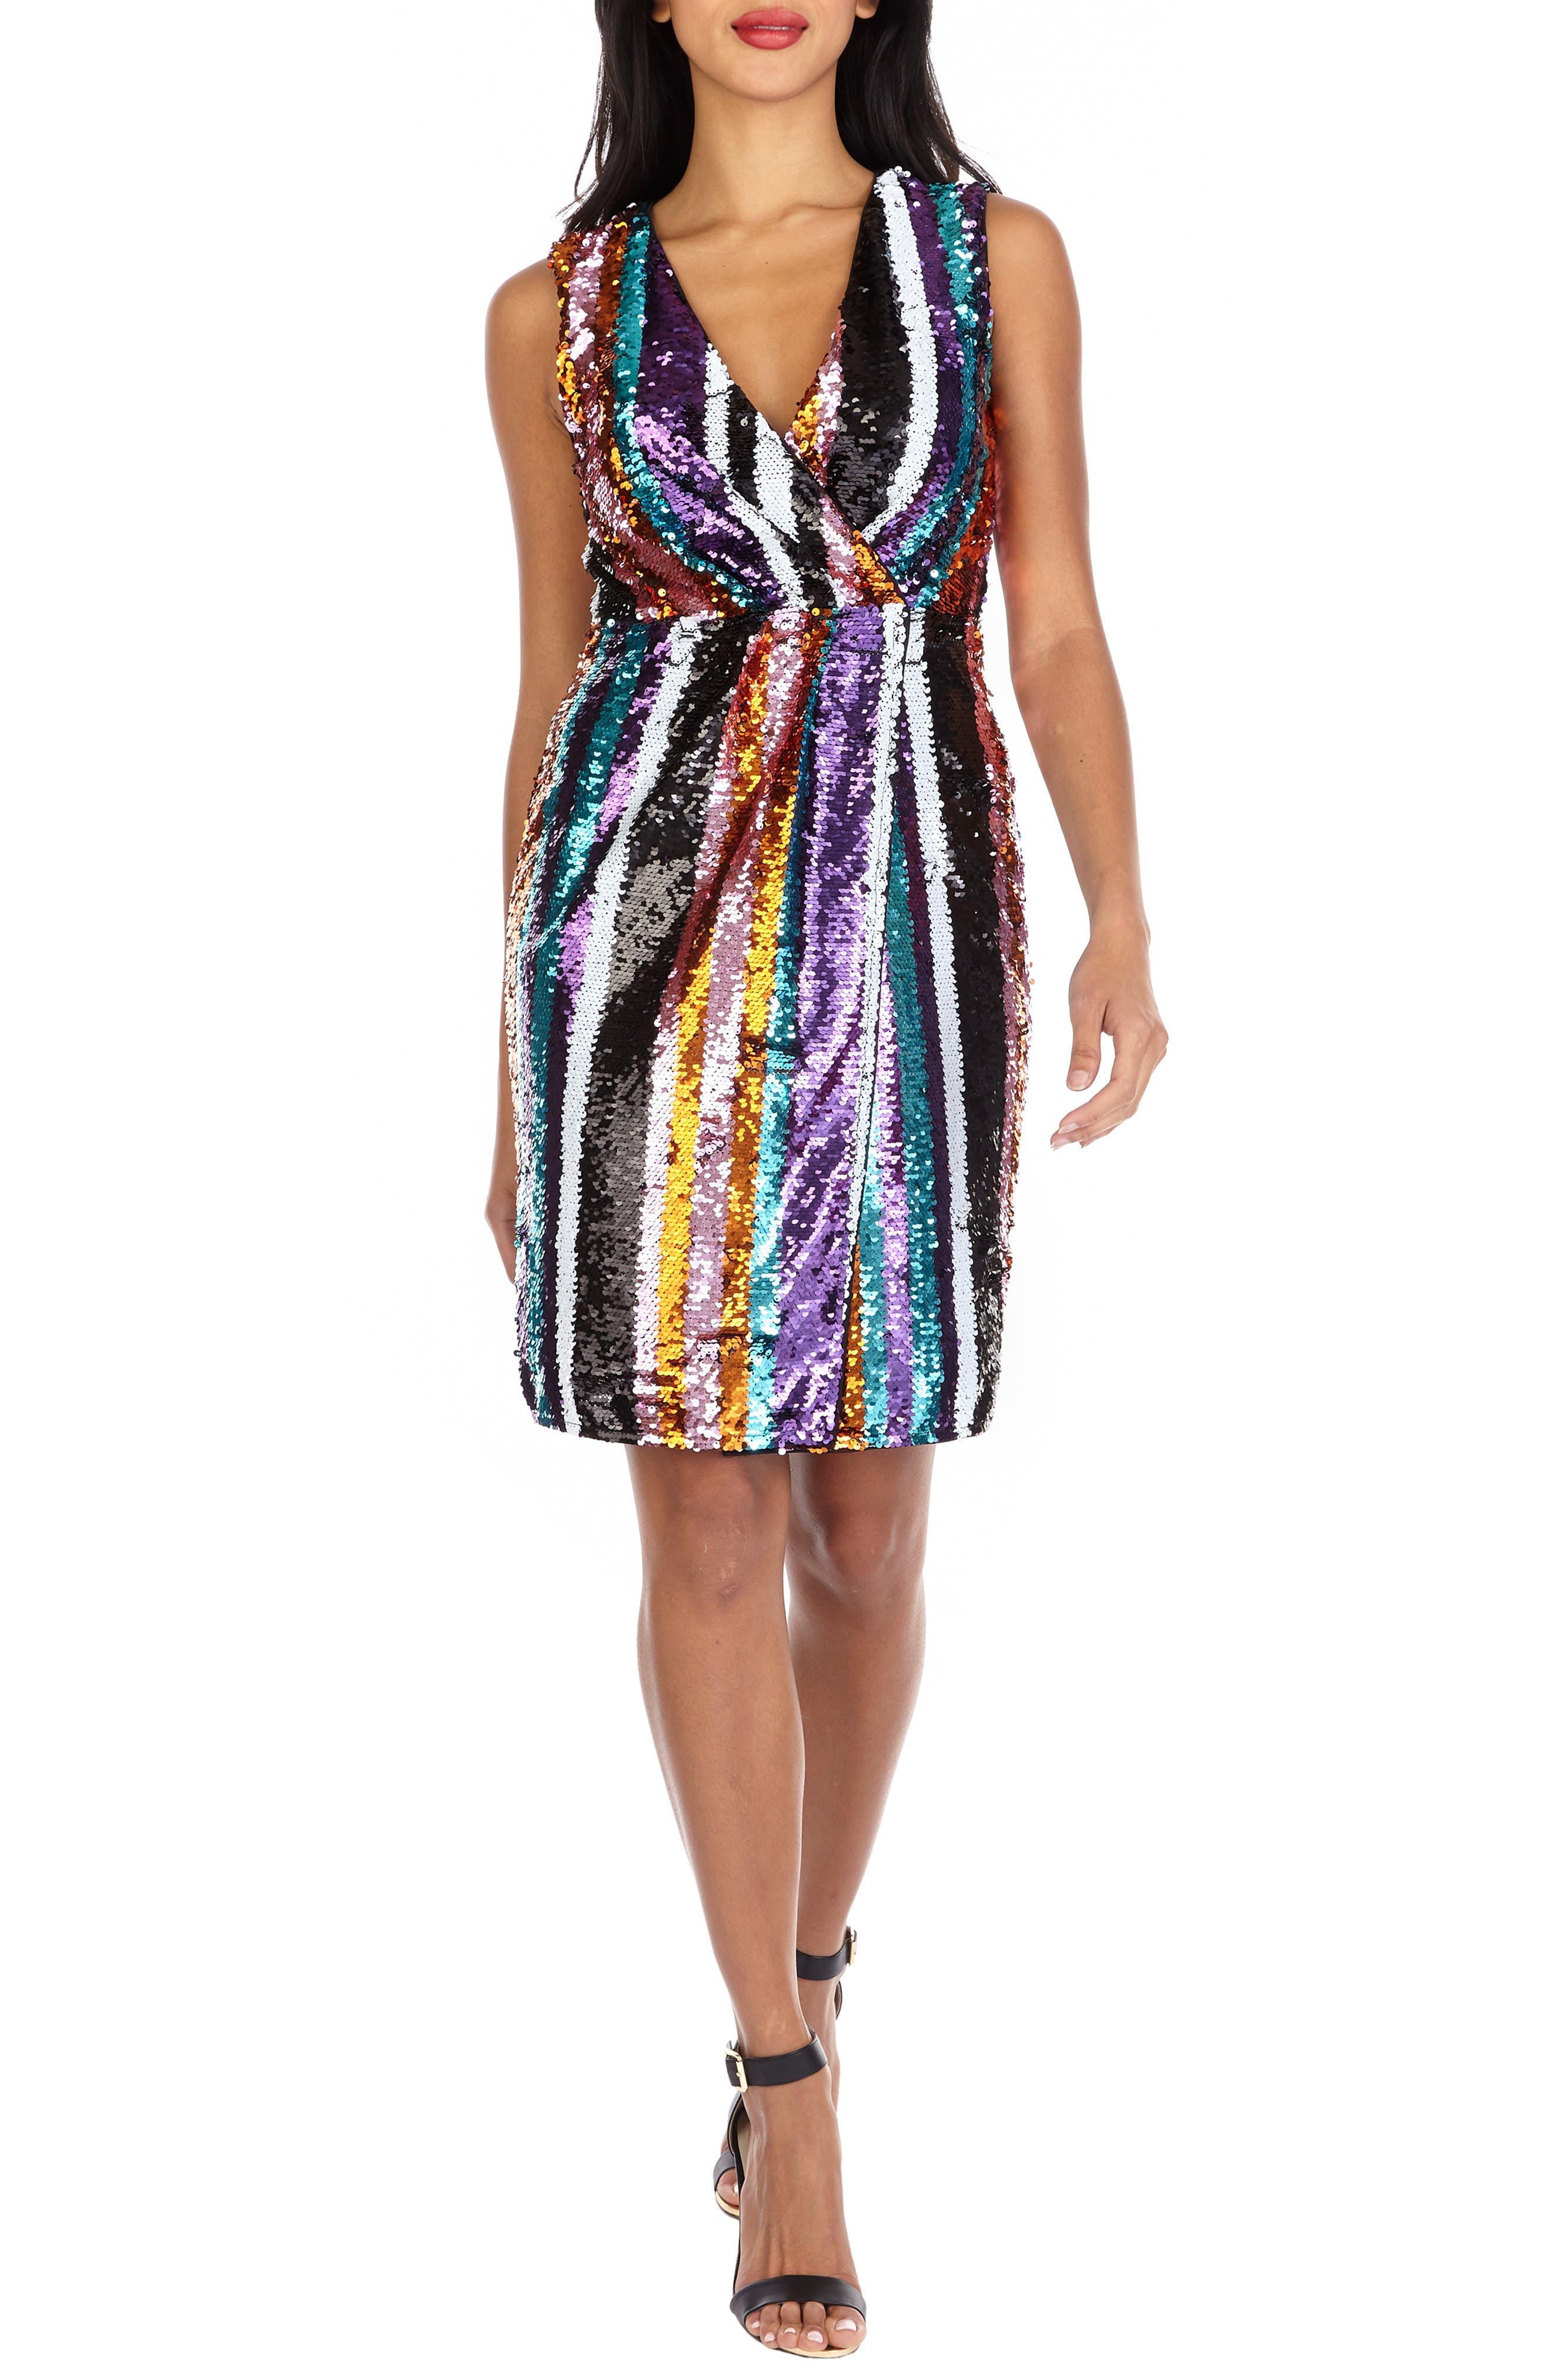 Sarah Rainbow Sequin Stripe Cocktail Sheath,                             Main thumbnail 1, color,                             MULTI PURPLE